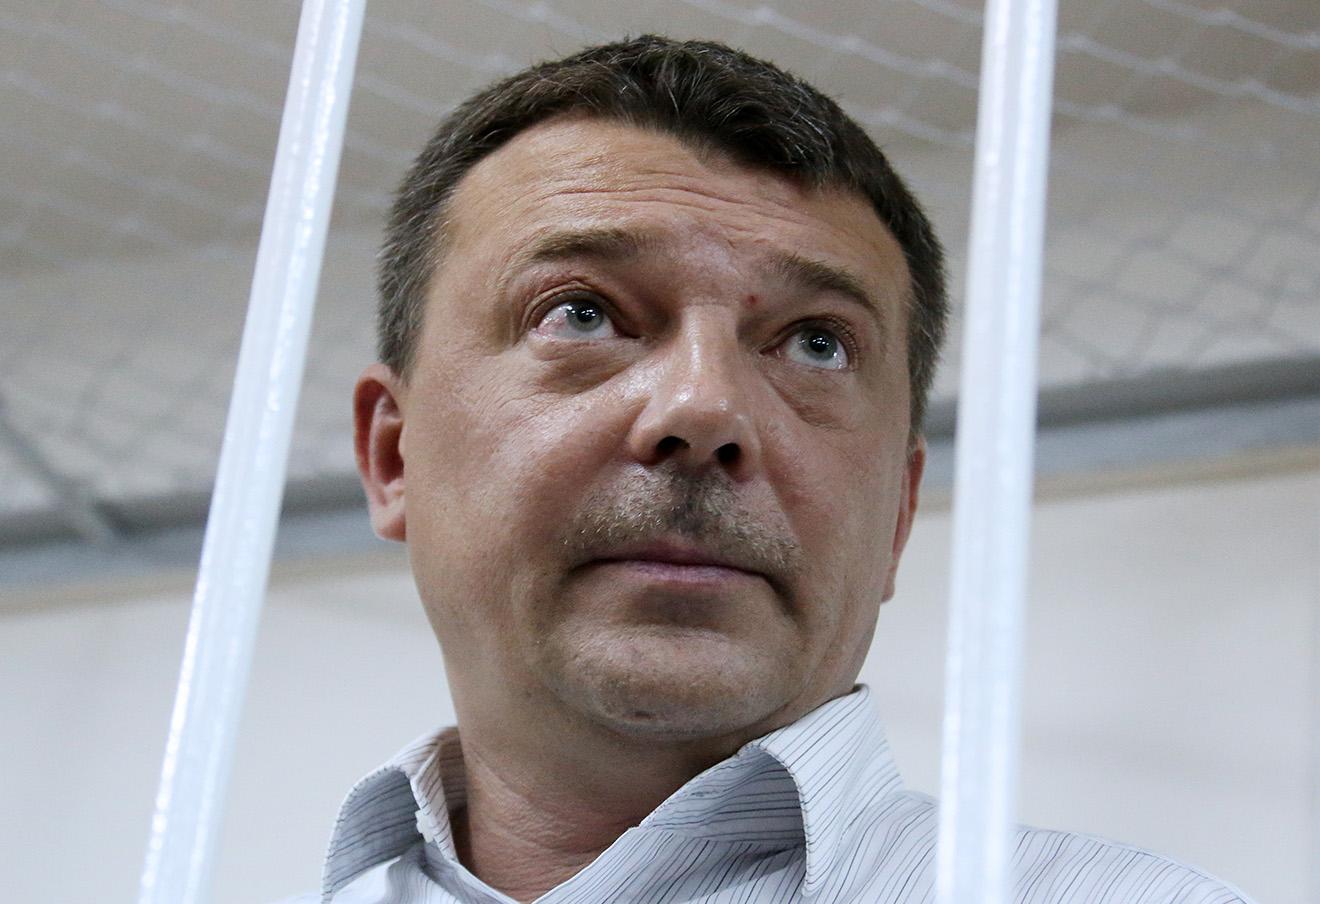 Михаил Максименко. Фото: Артем Коротаев / ТАСС